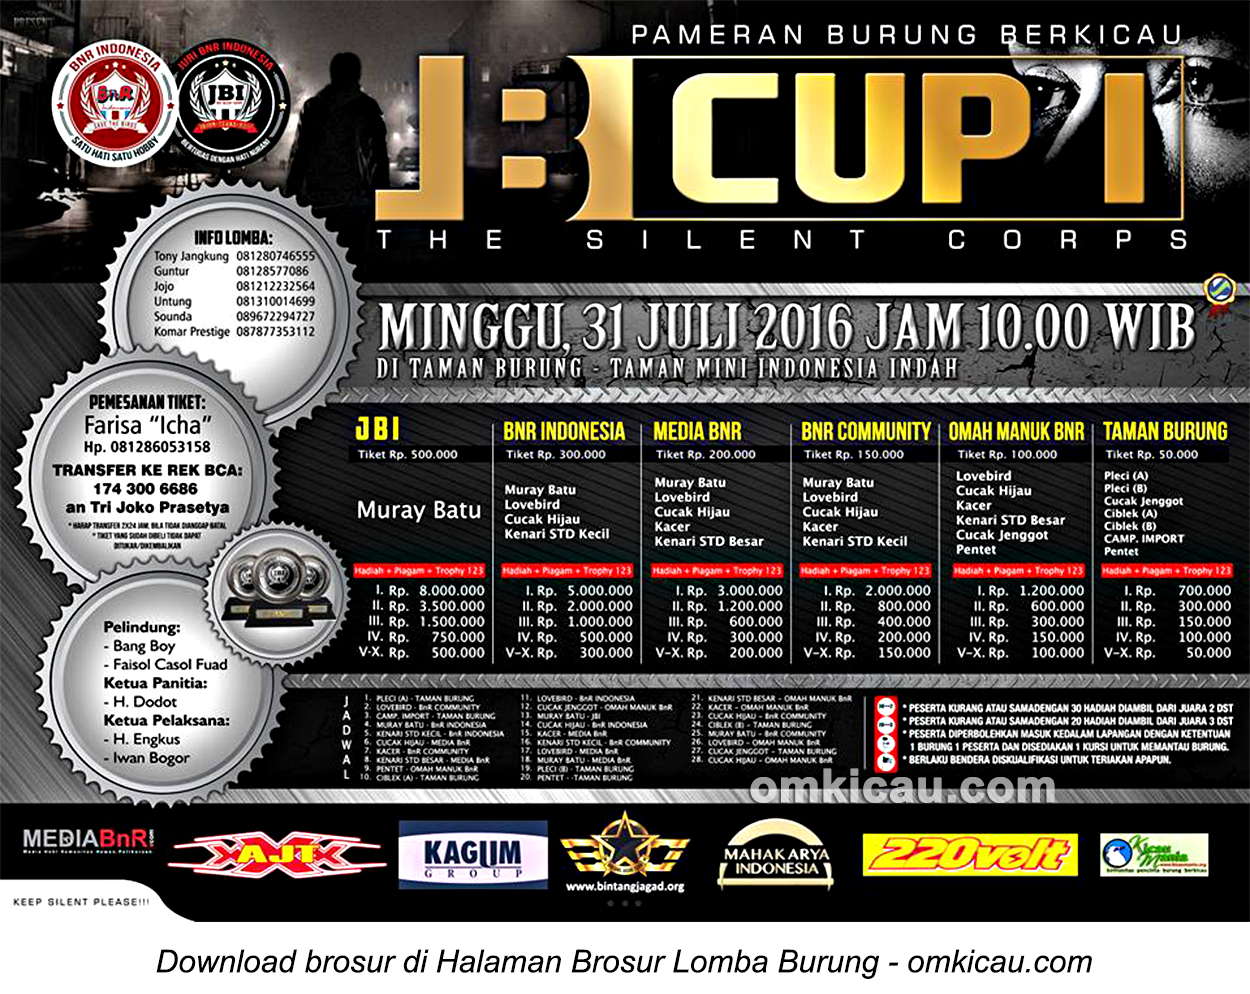 Brosur Lomba Burung Berkicau JBI Cup 1, Jakarta, 31 Juli 2016